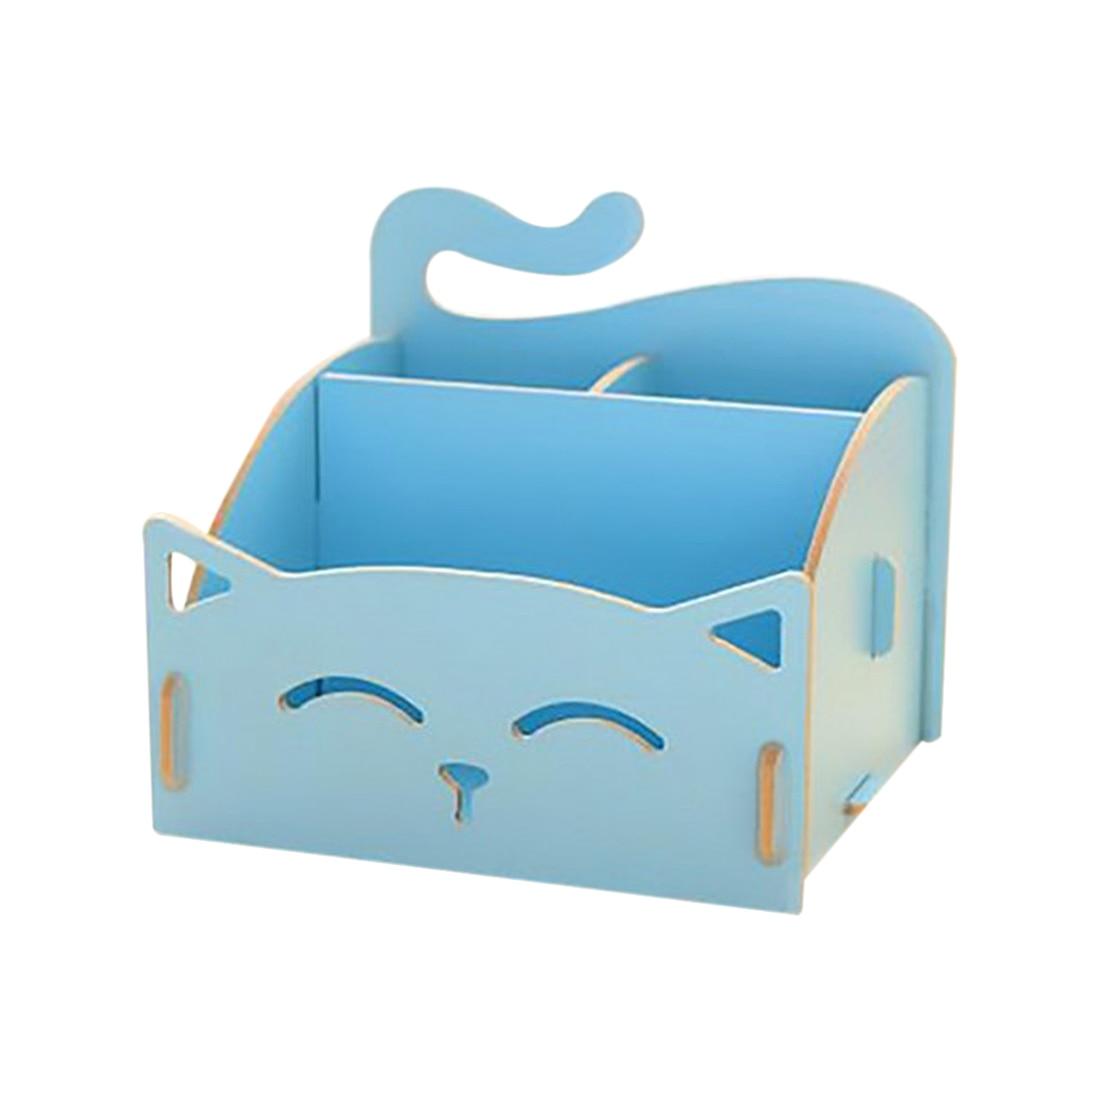 Wooden Box Cute Cat Pen Box Desktop Storage Assembly DIY Wood Makeup Organizer Cosmetics Storage Box